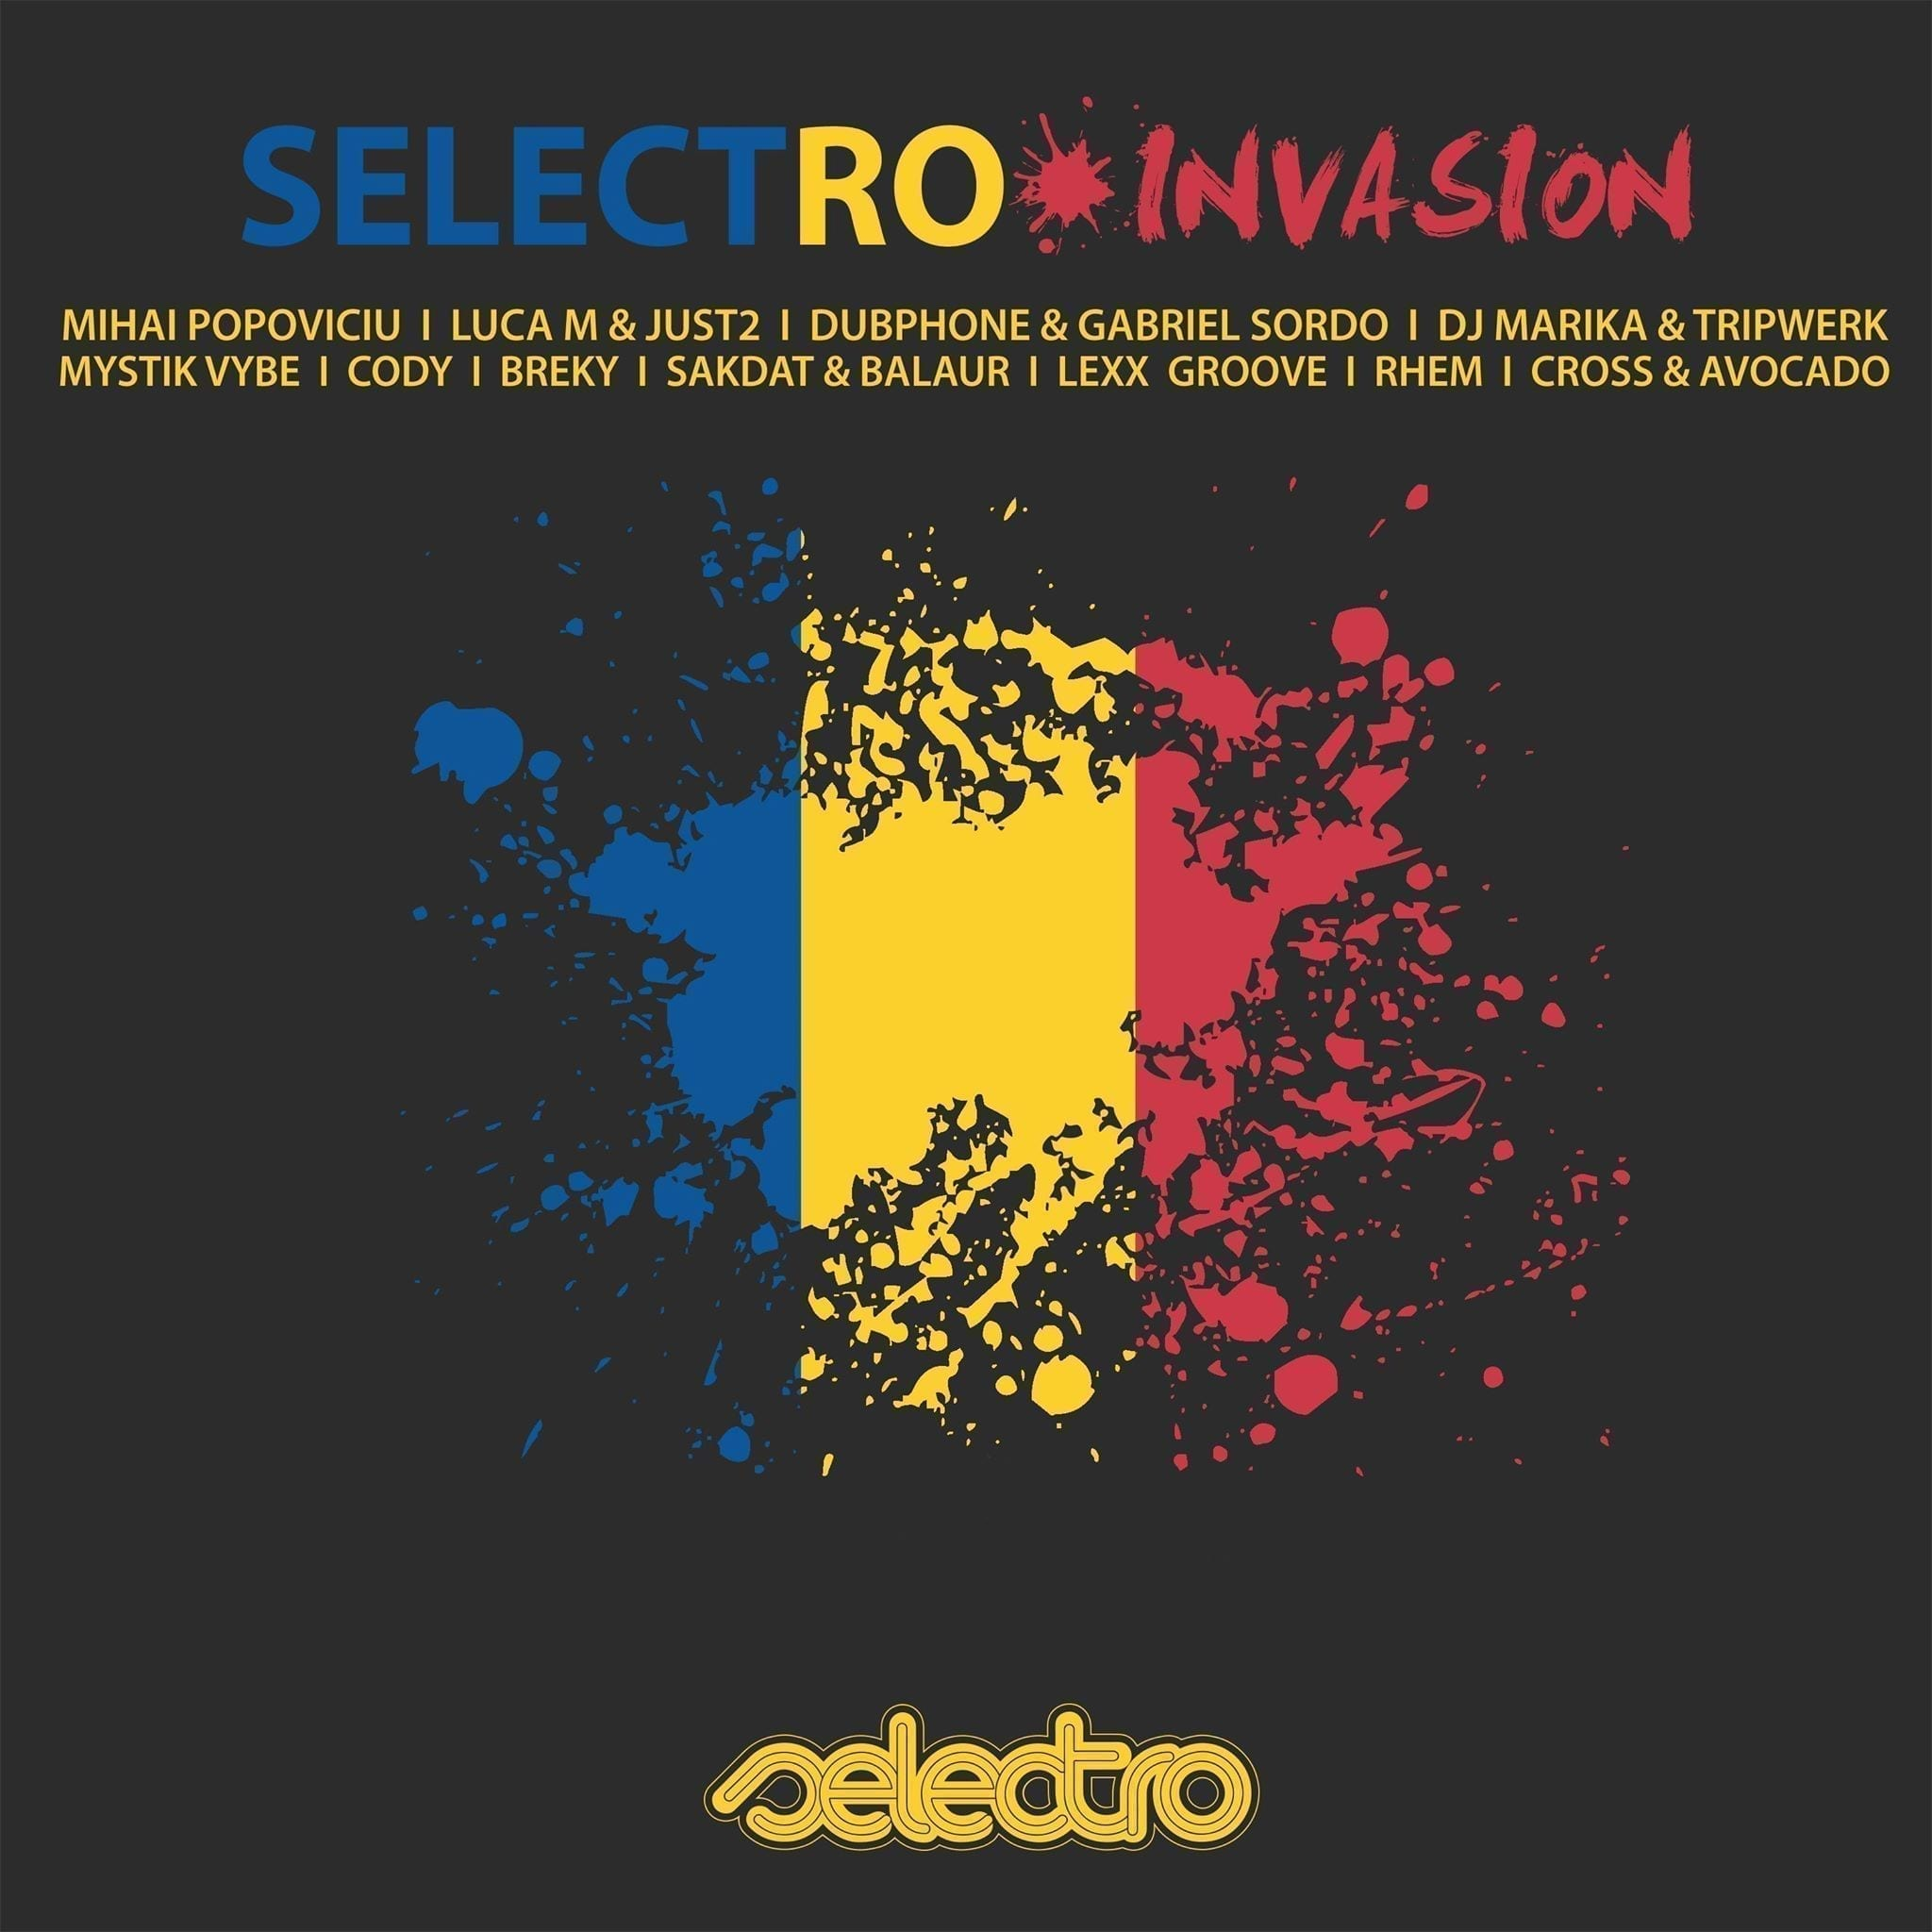 SelectRO Invasion